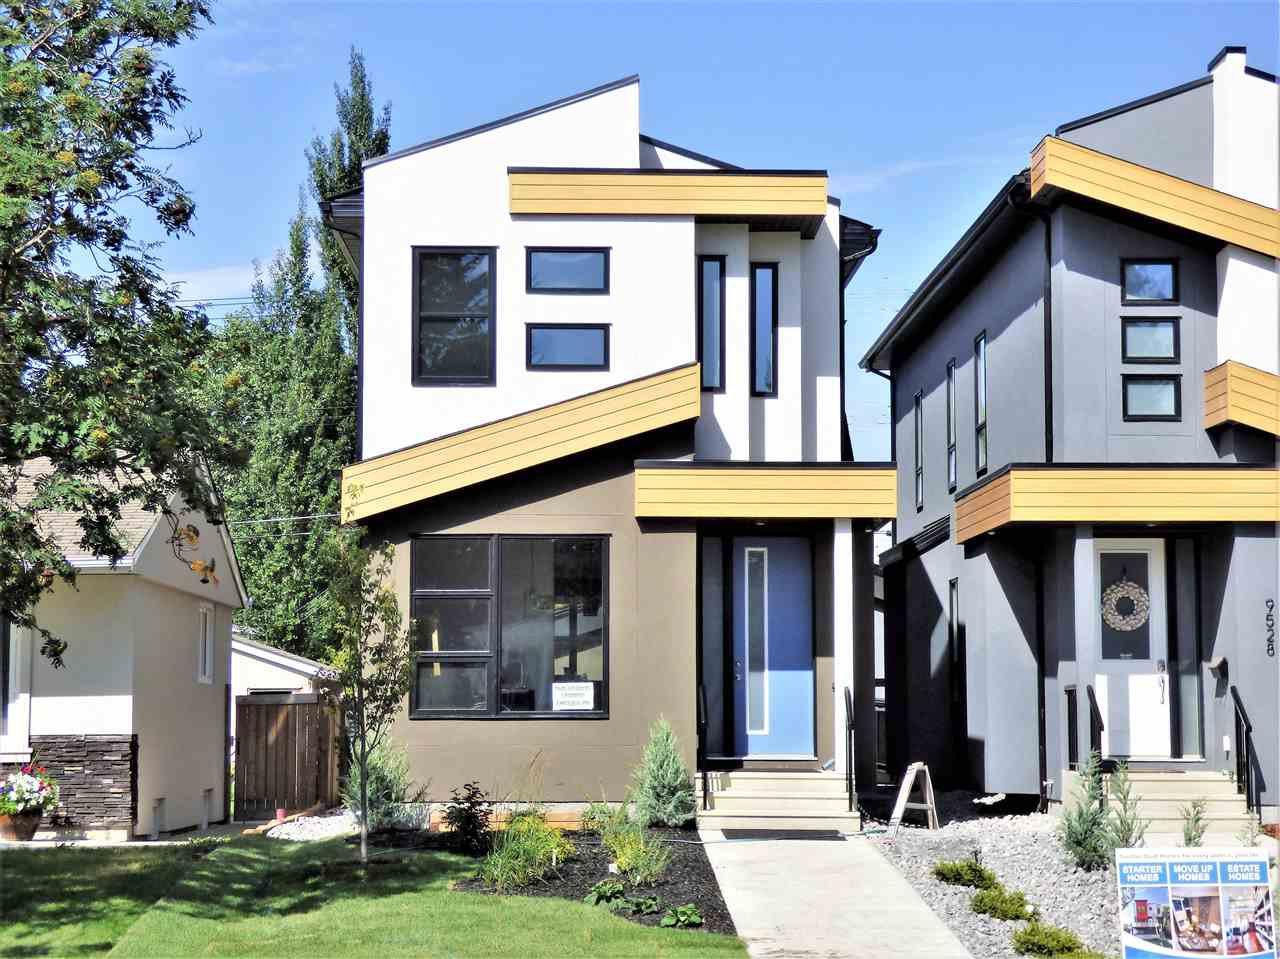 Main Photo:  in Edmonton: Zone 10 House for sale : MLS®# E4120889